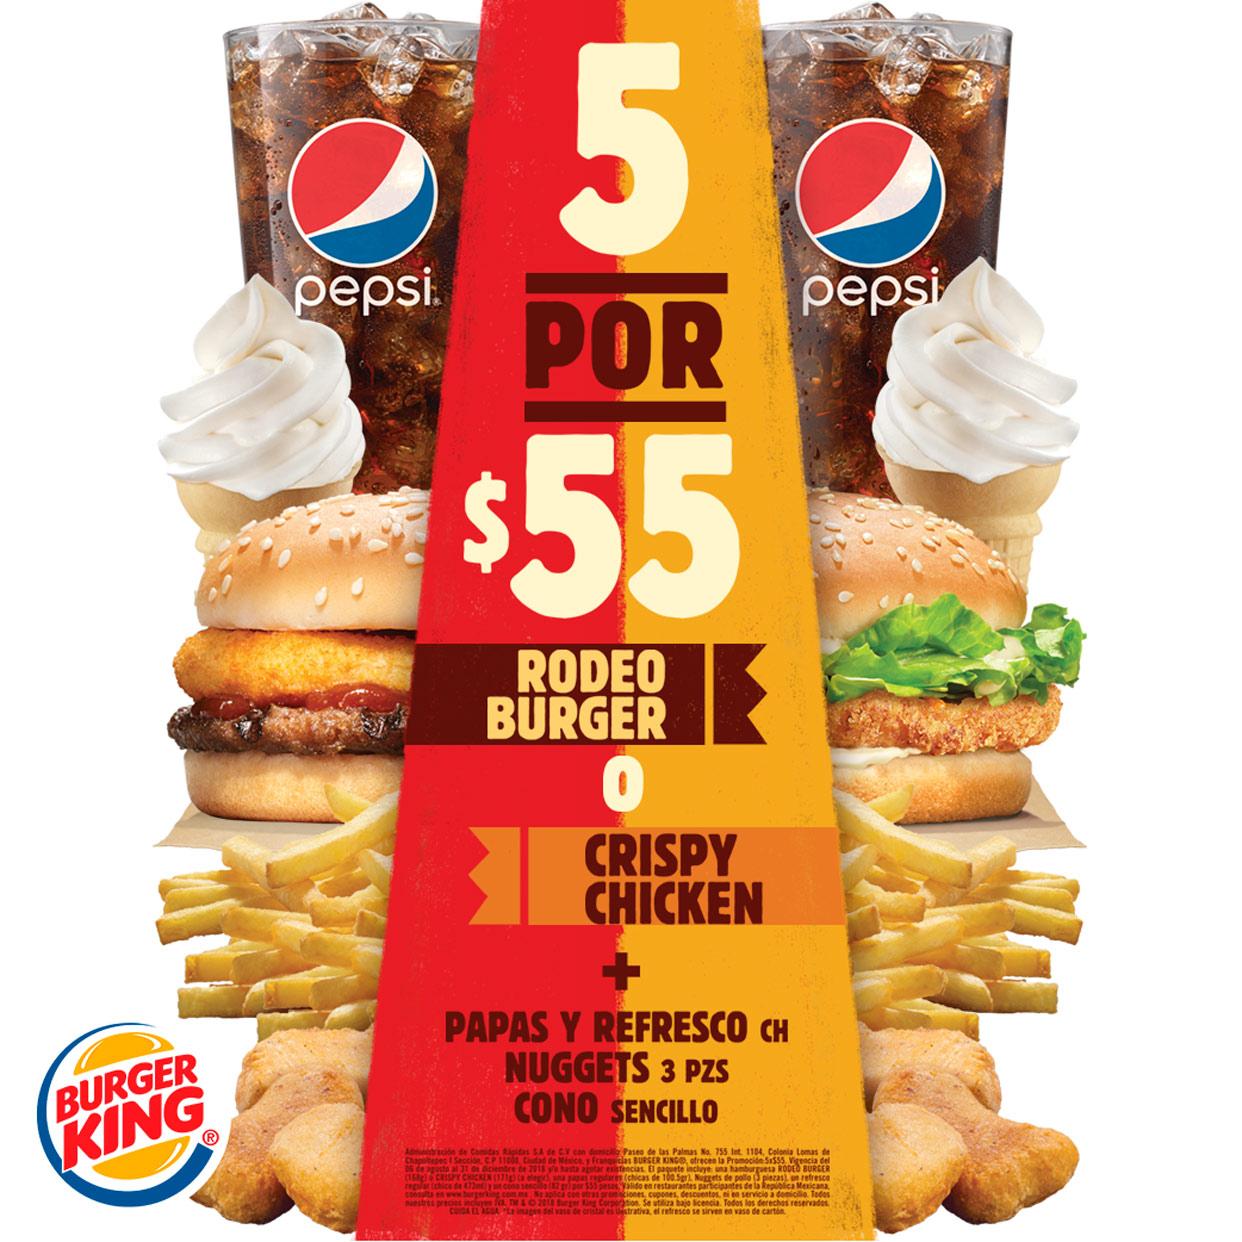 Burger King: Hamburguesa (Rodeo Burger ó Crispy Chicken) + refresco + papas + cono + 3 nuggets por $55